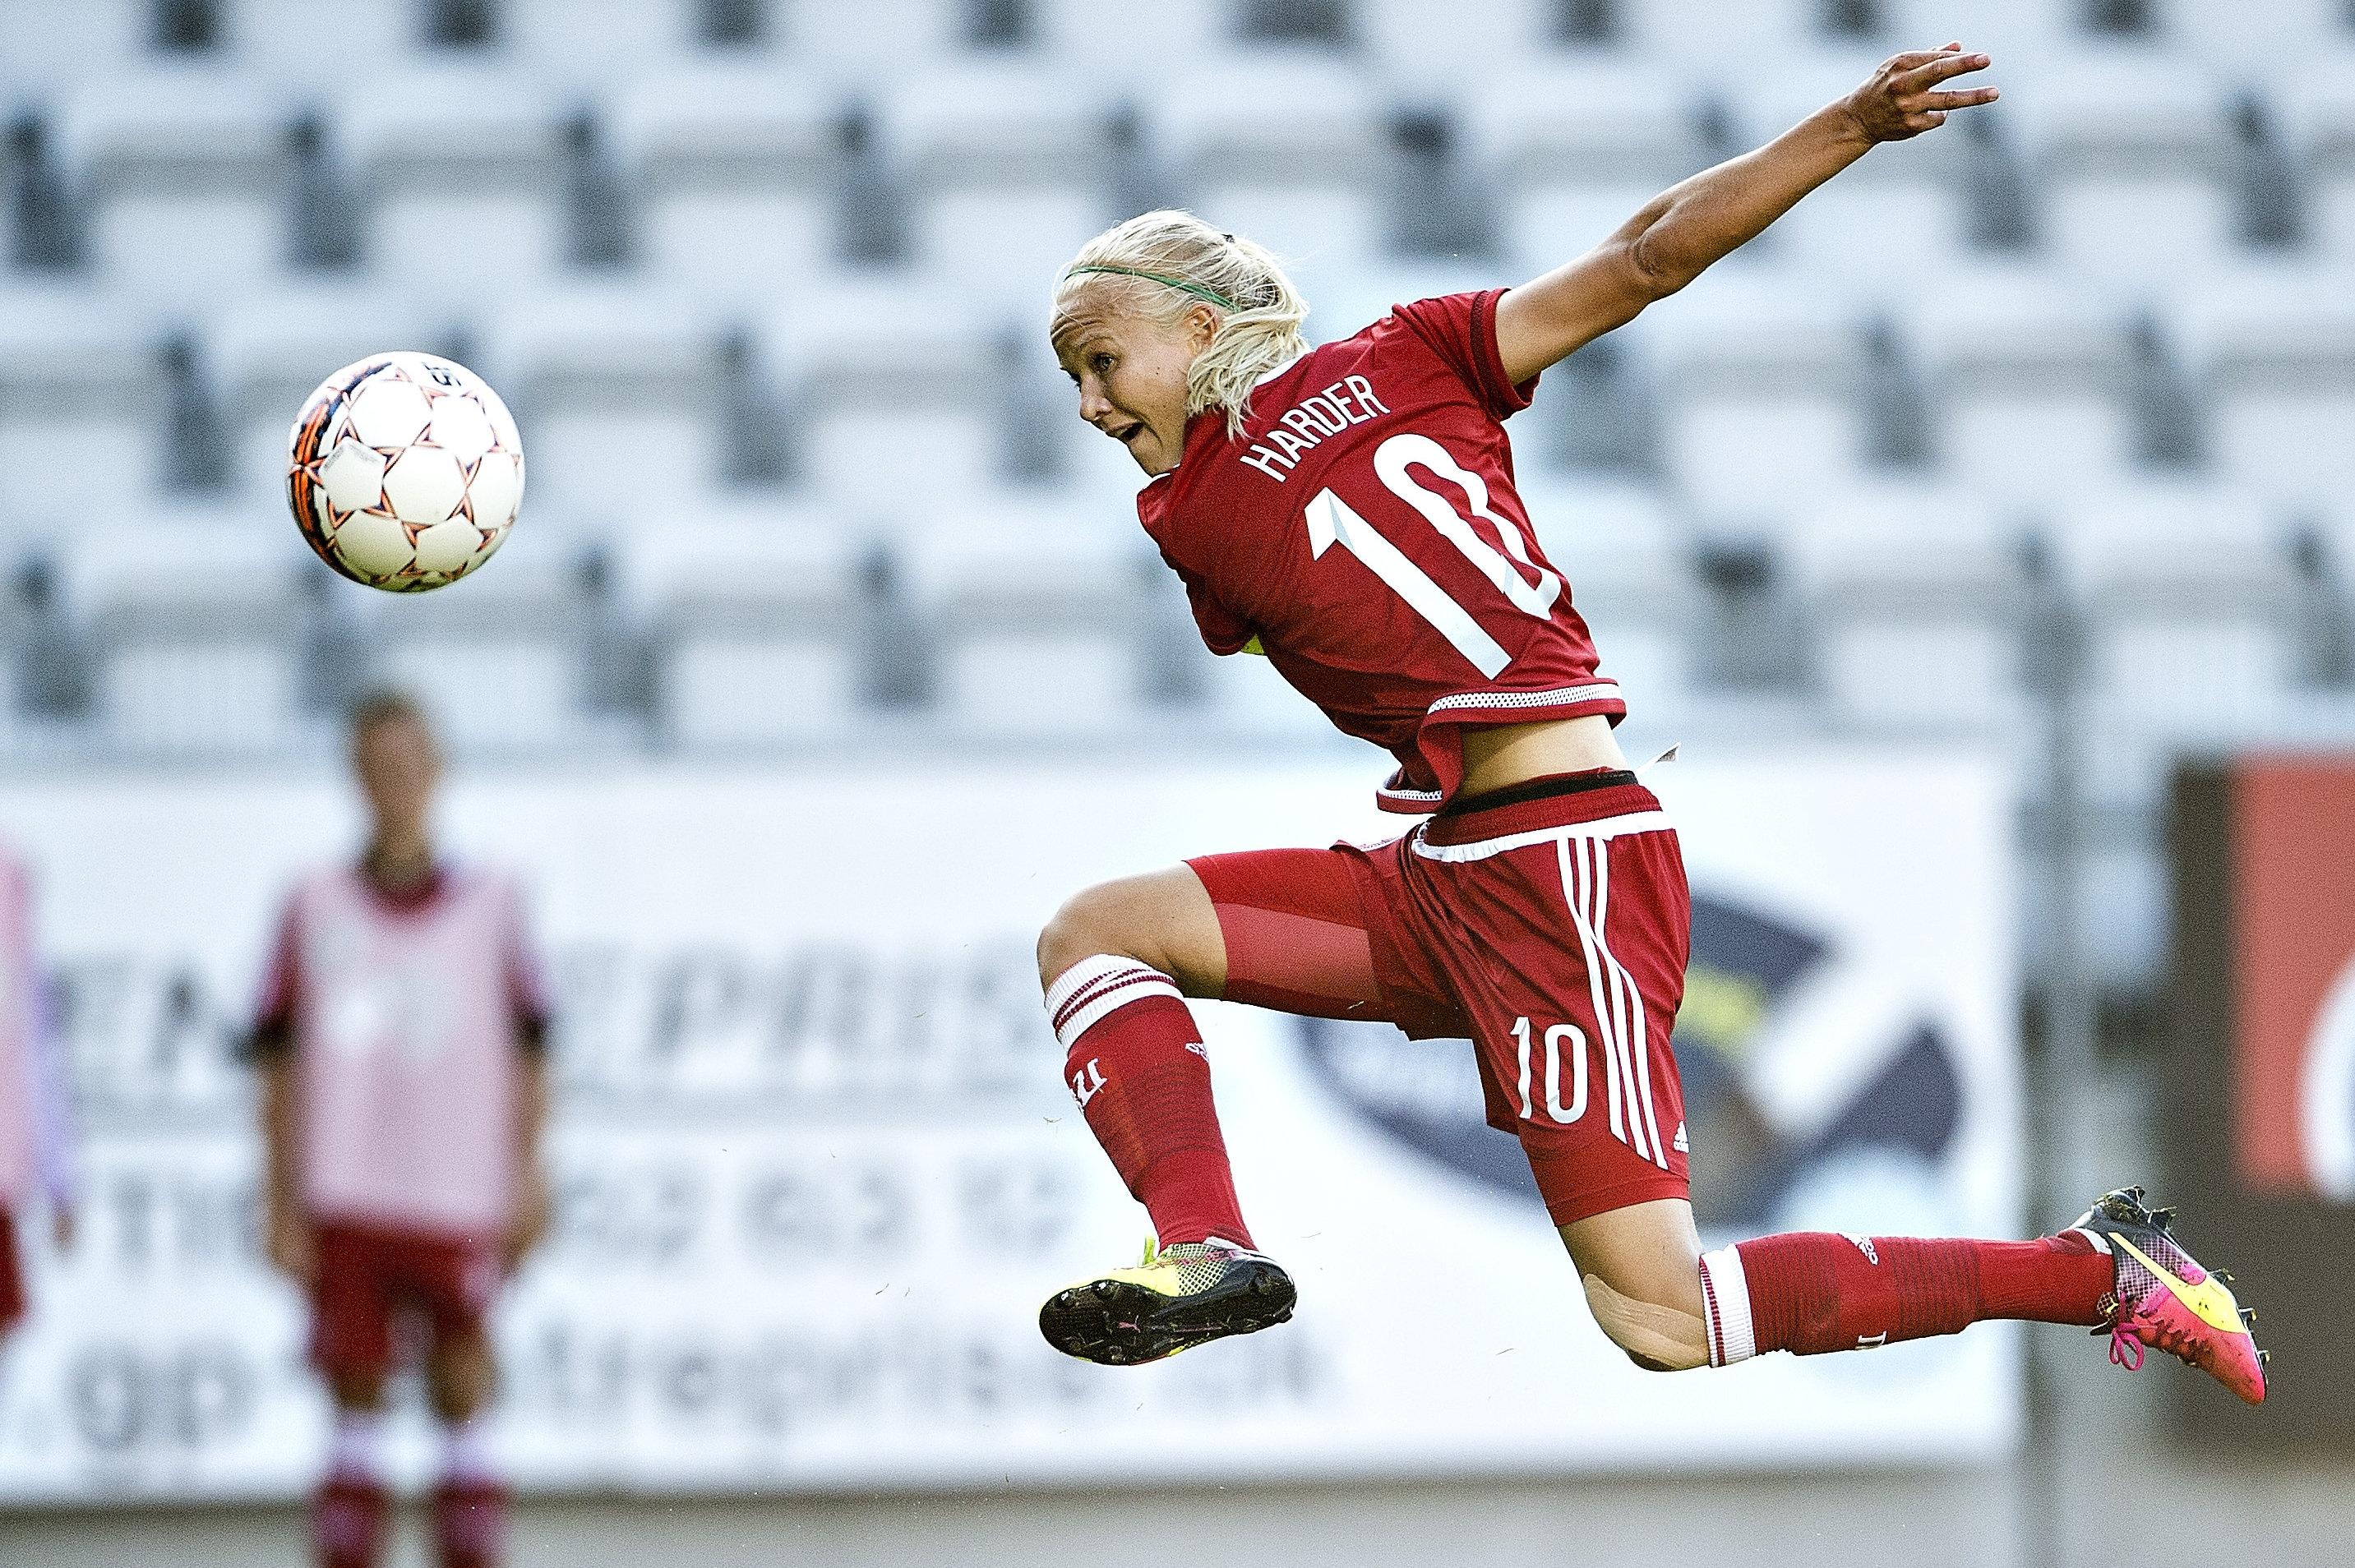 island kvindefodbold